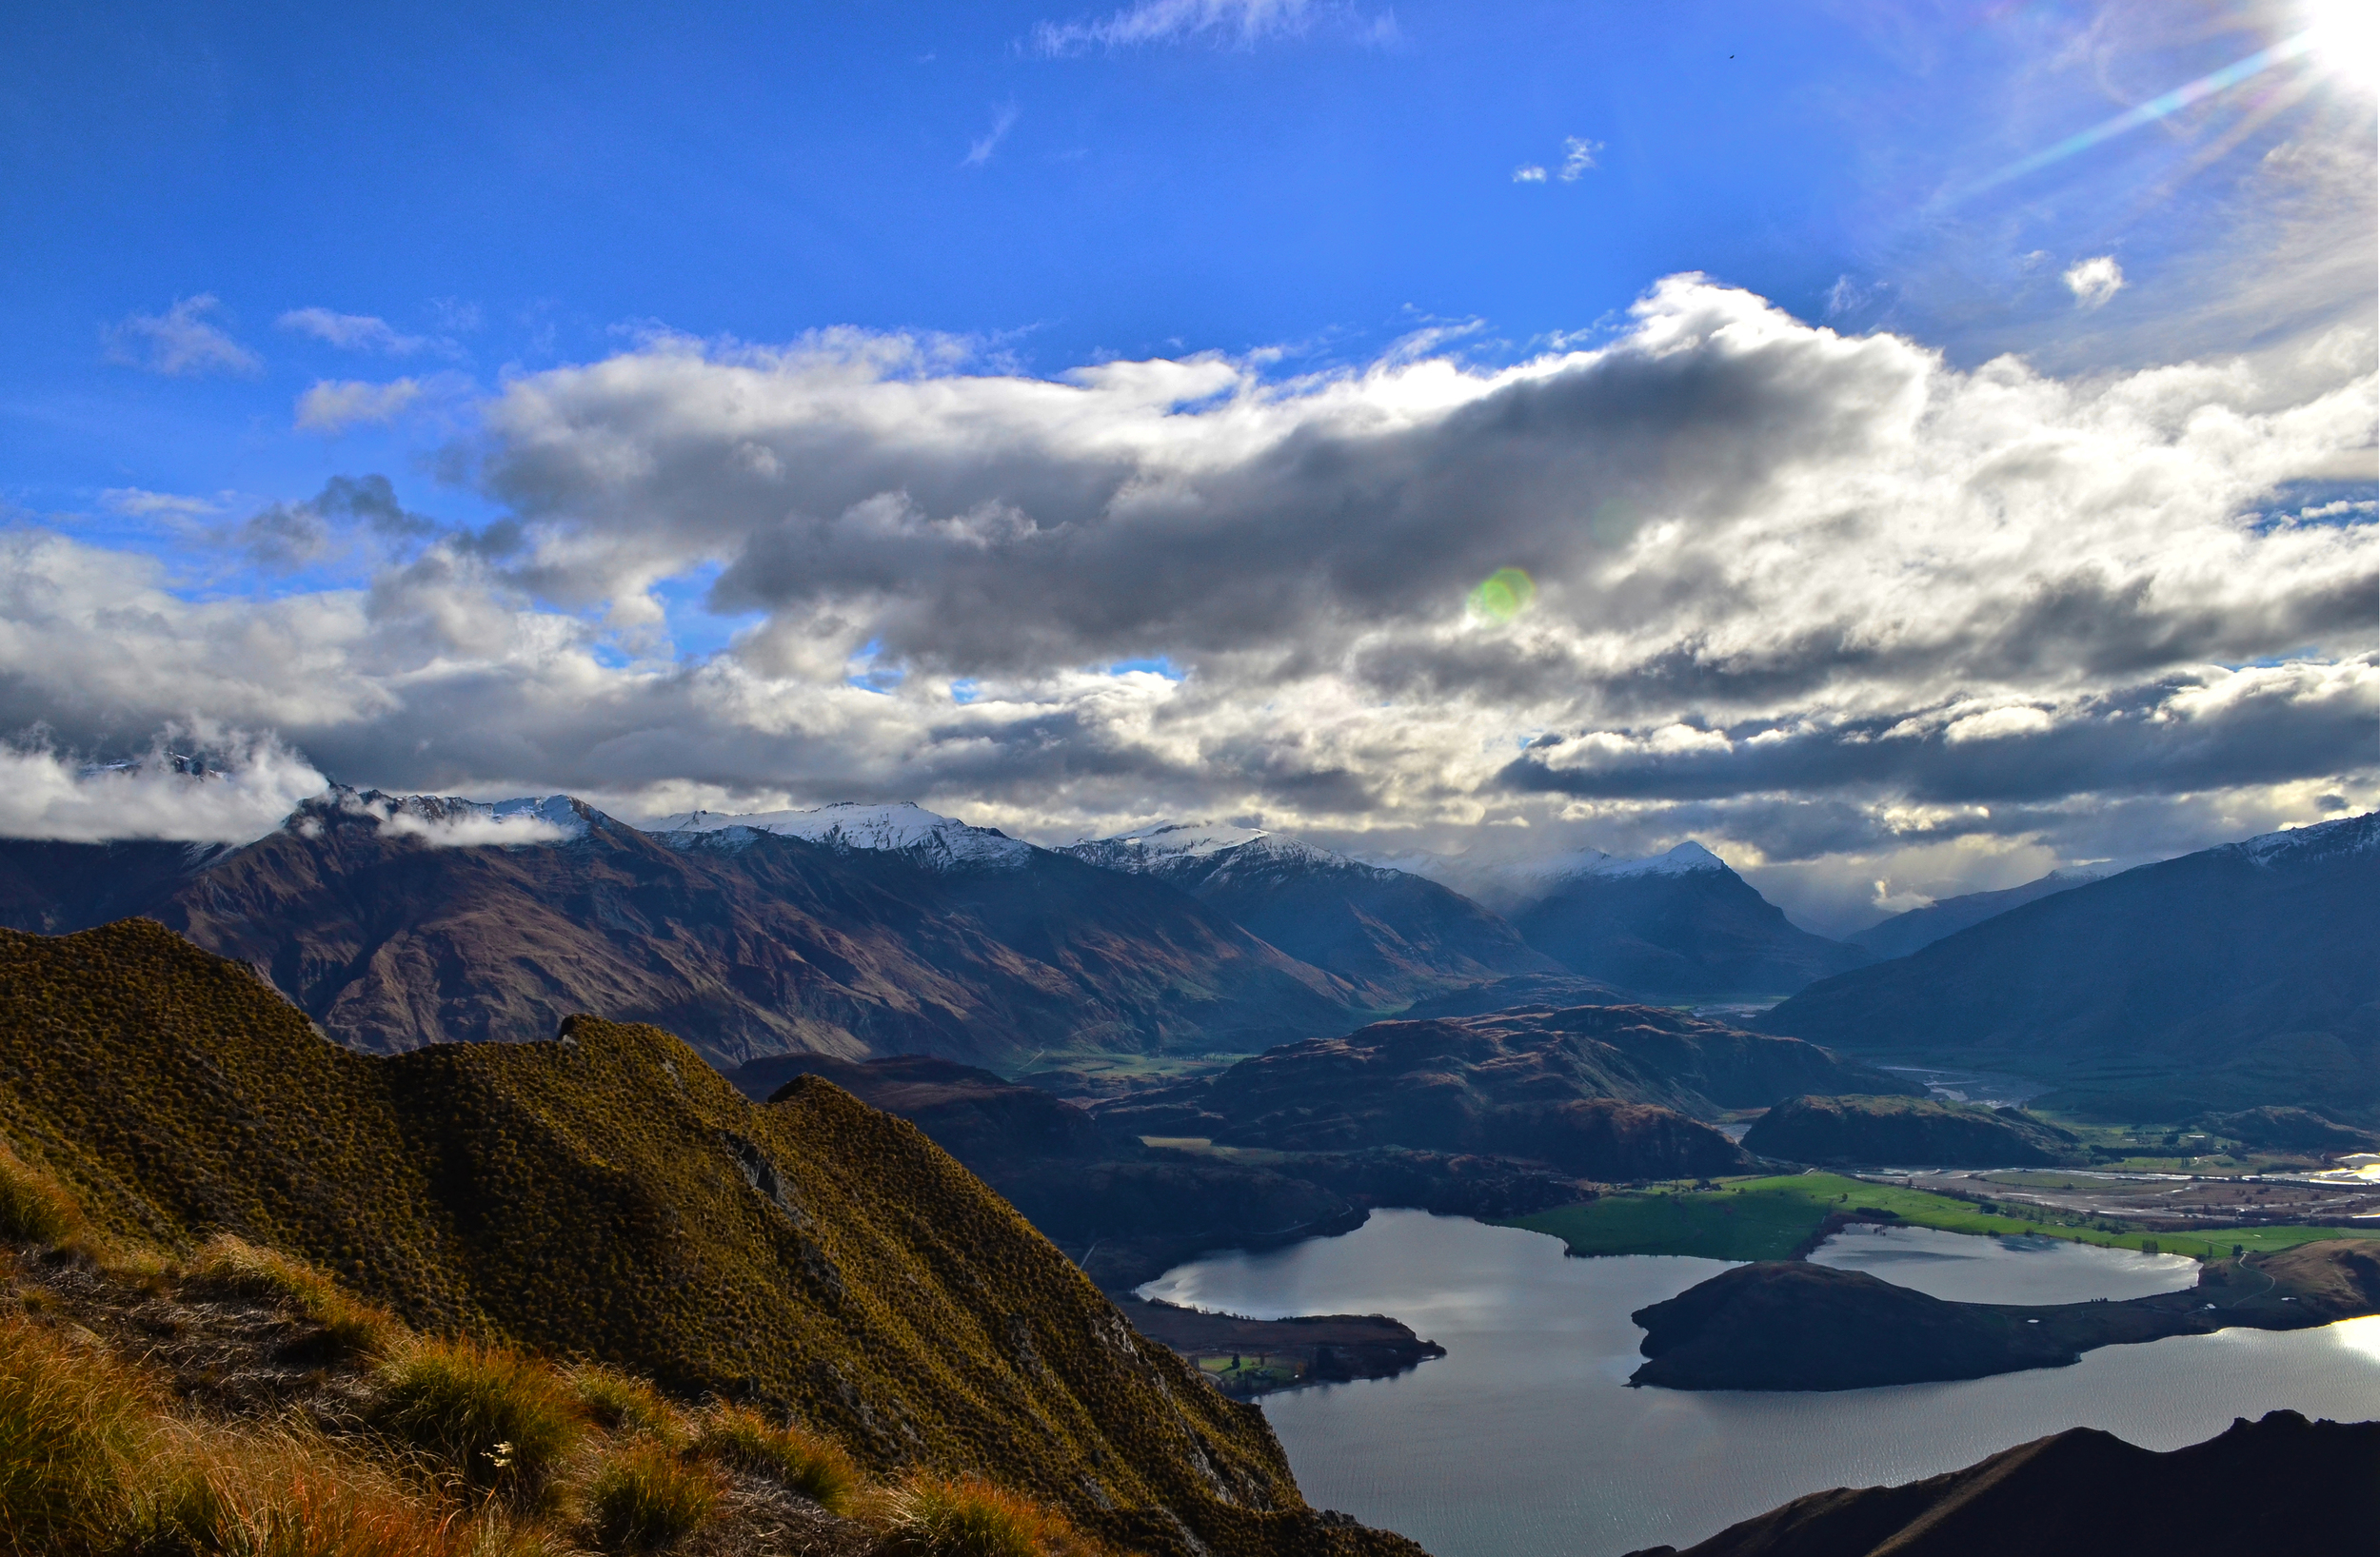 [7] Looking over Lake Wanaka, South Island